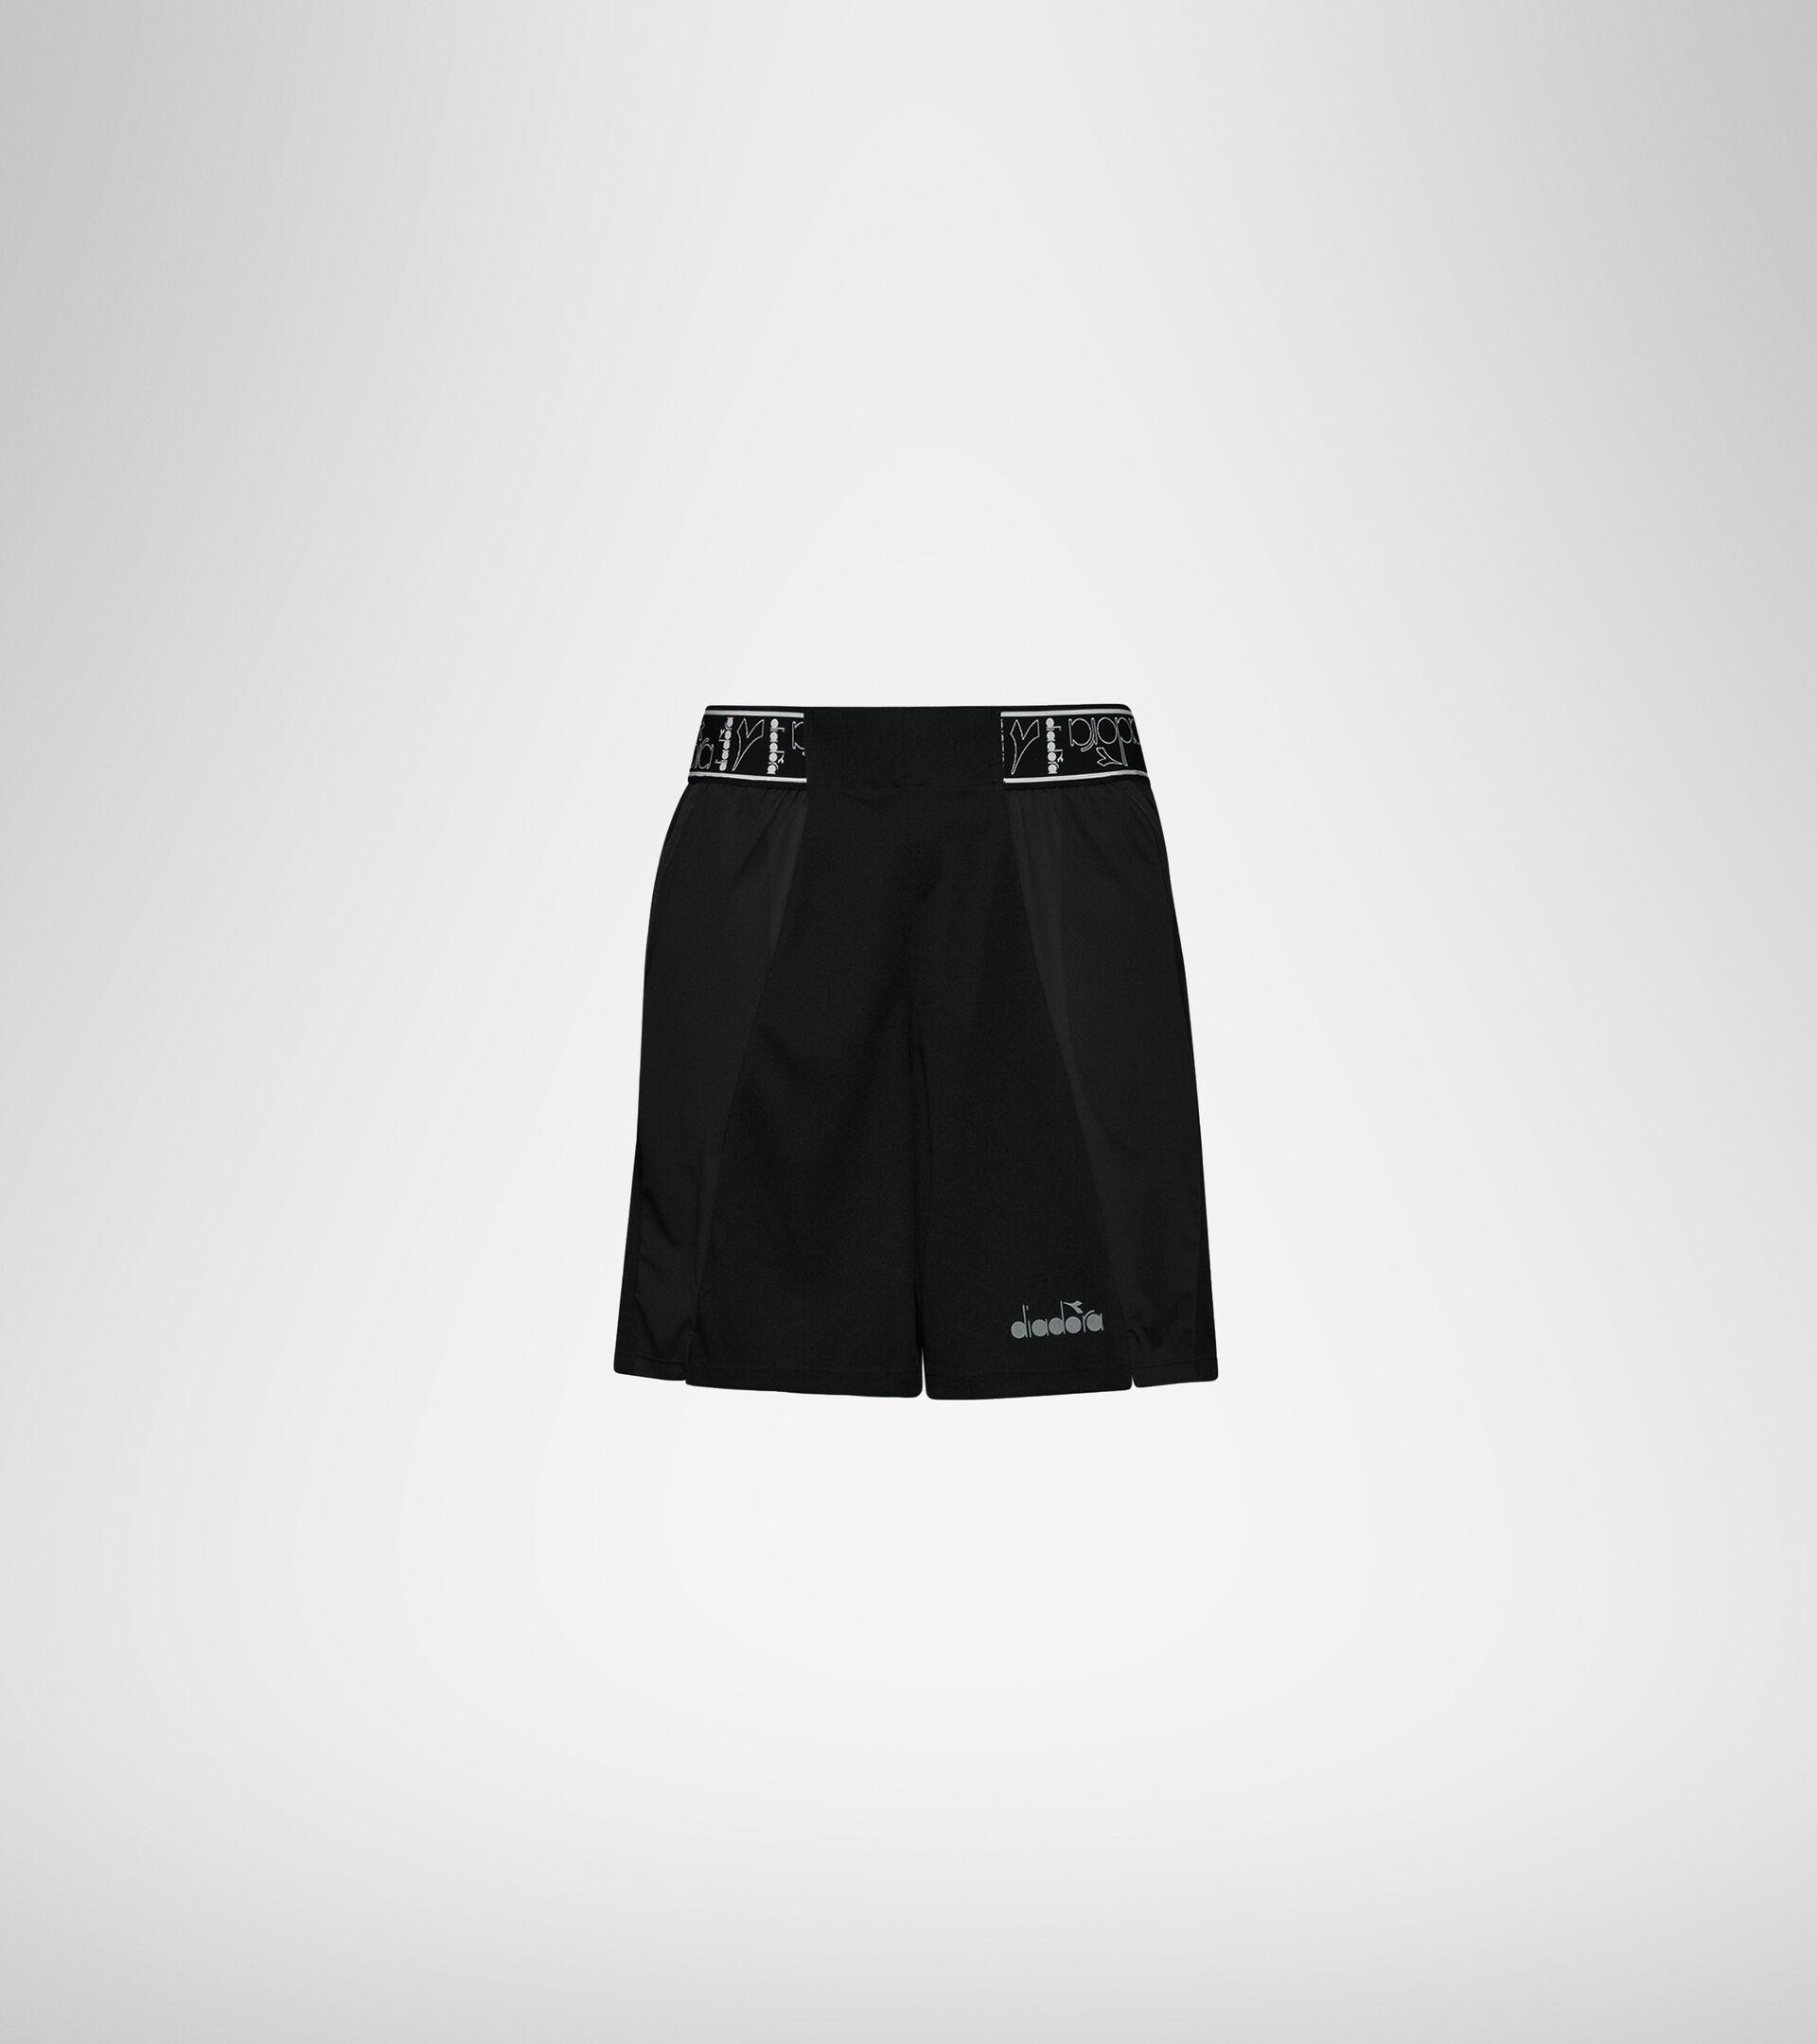 Running shorts - Men BERMUDA BE ONE BLACK - Diadora